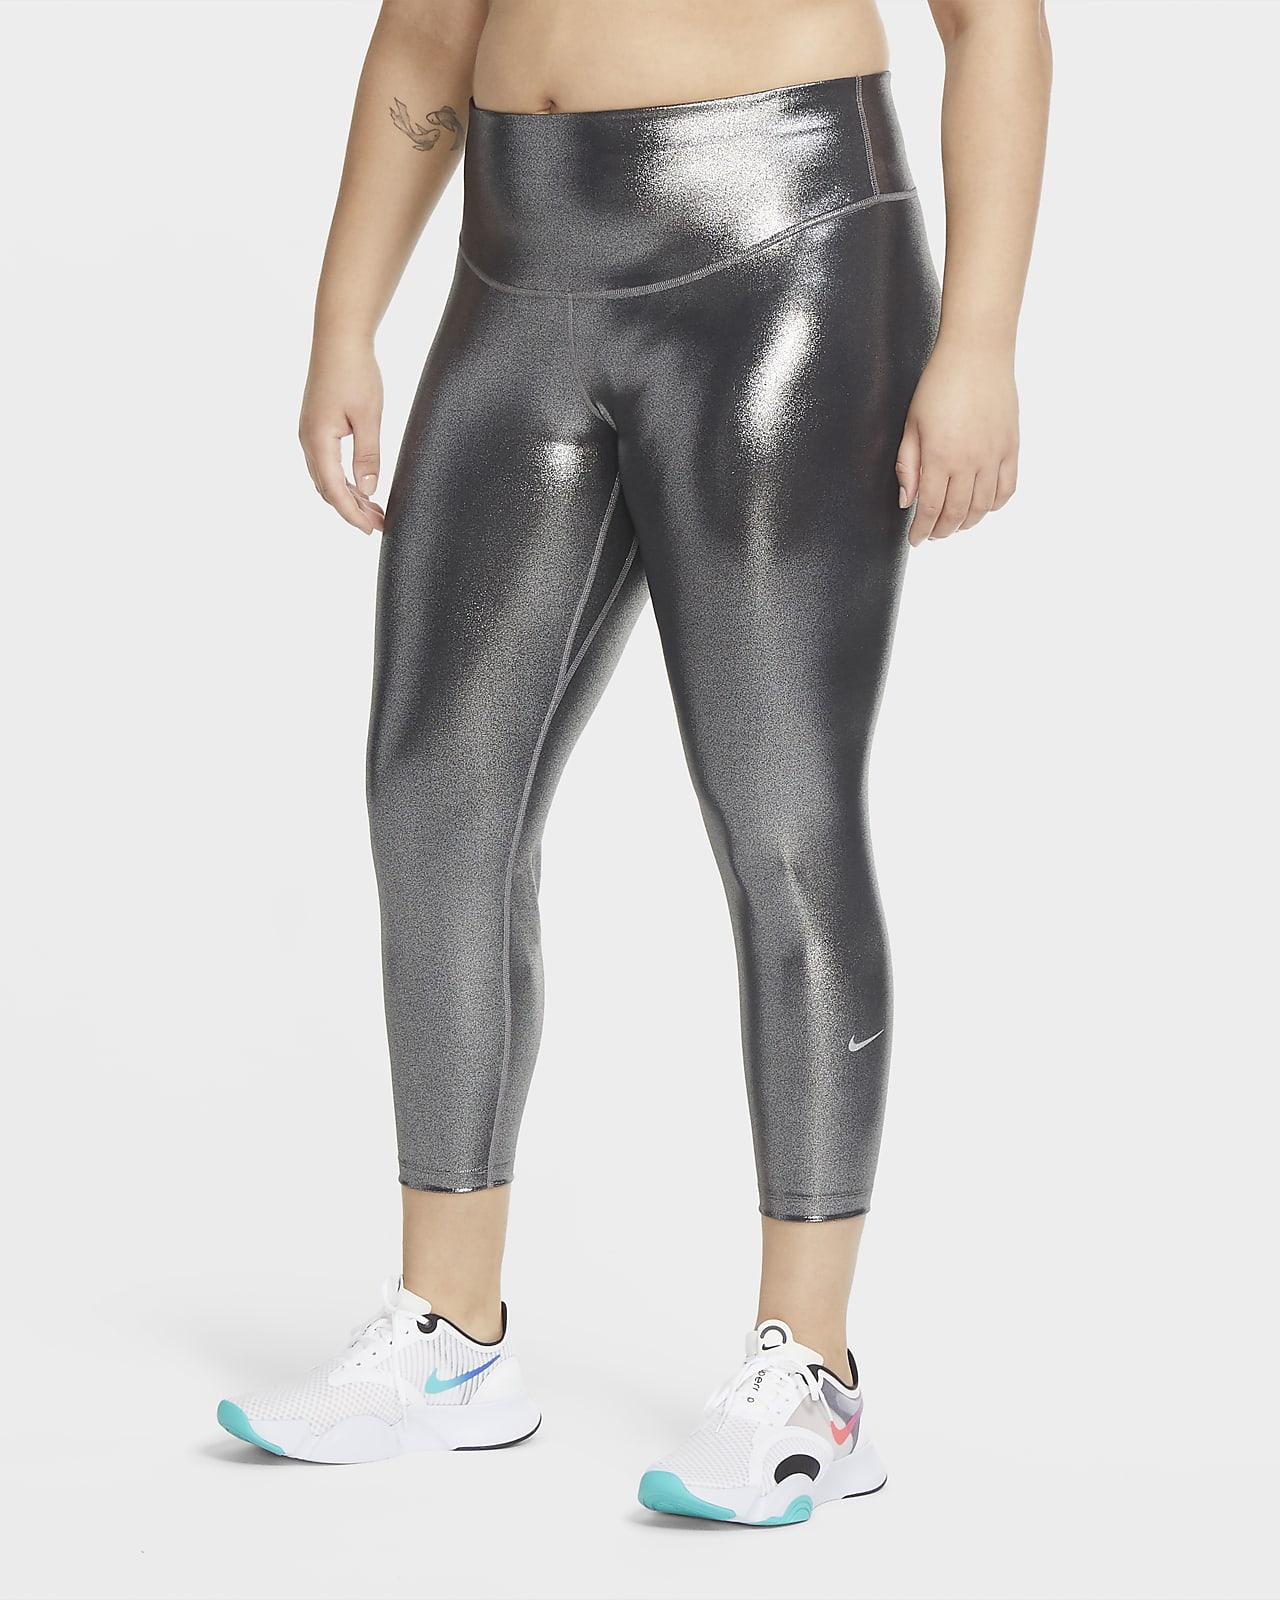 Legging 7/8 Nike One Icon Clash pour Femme (grande taille)